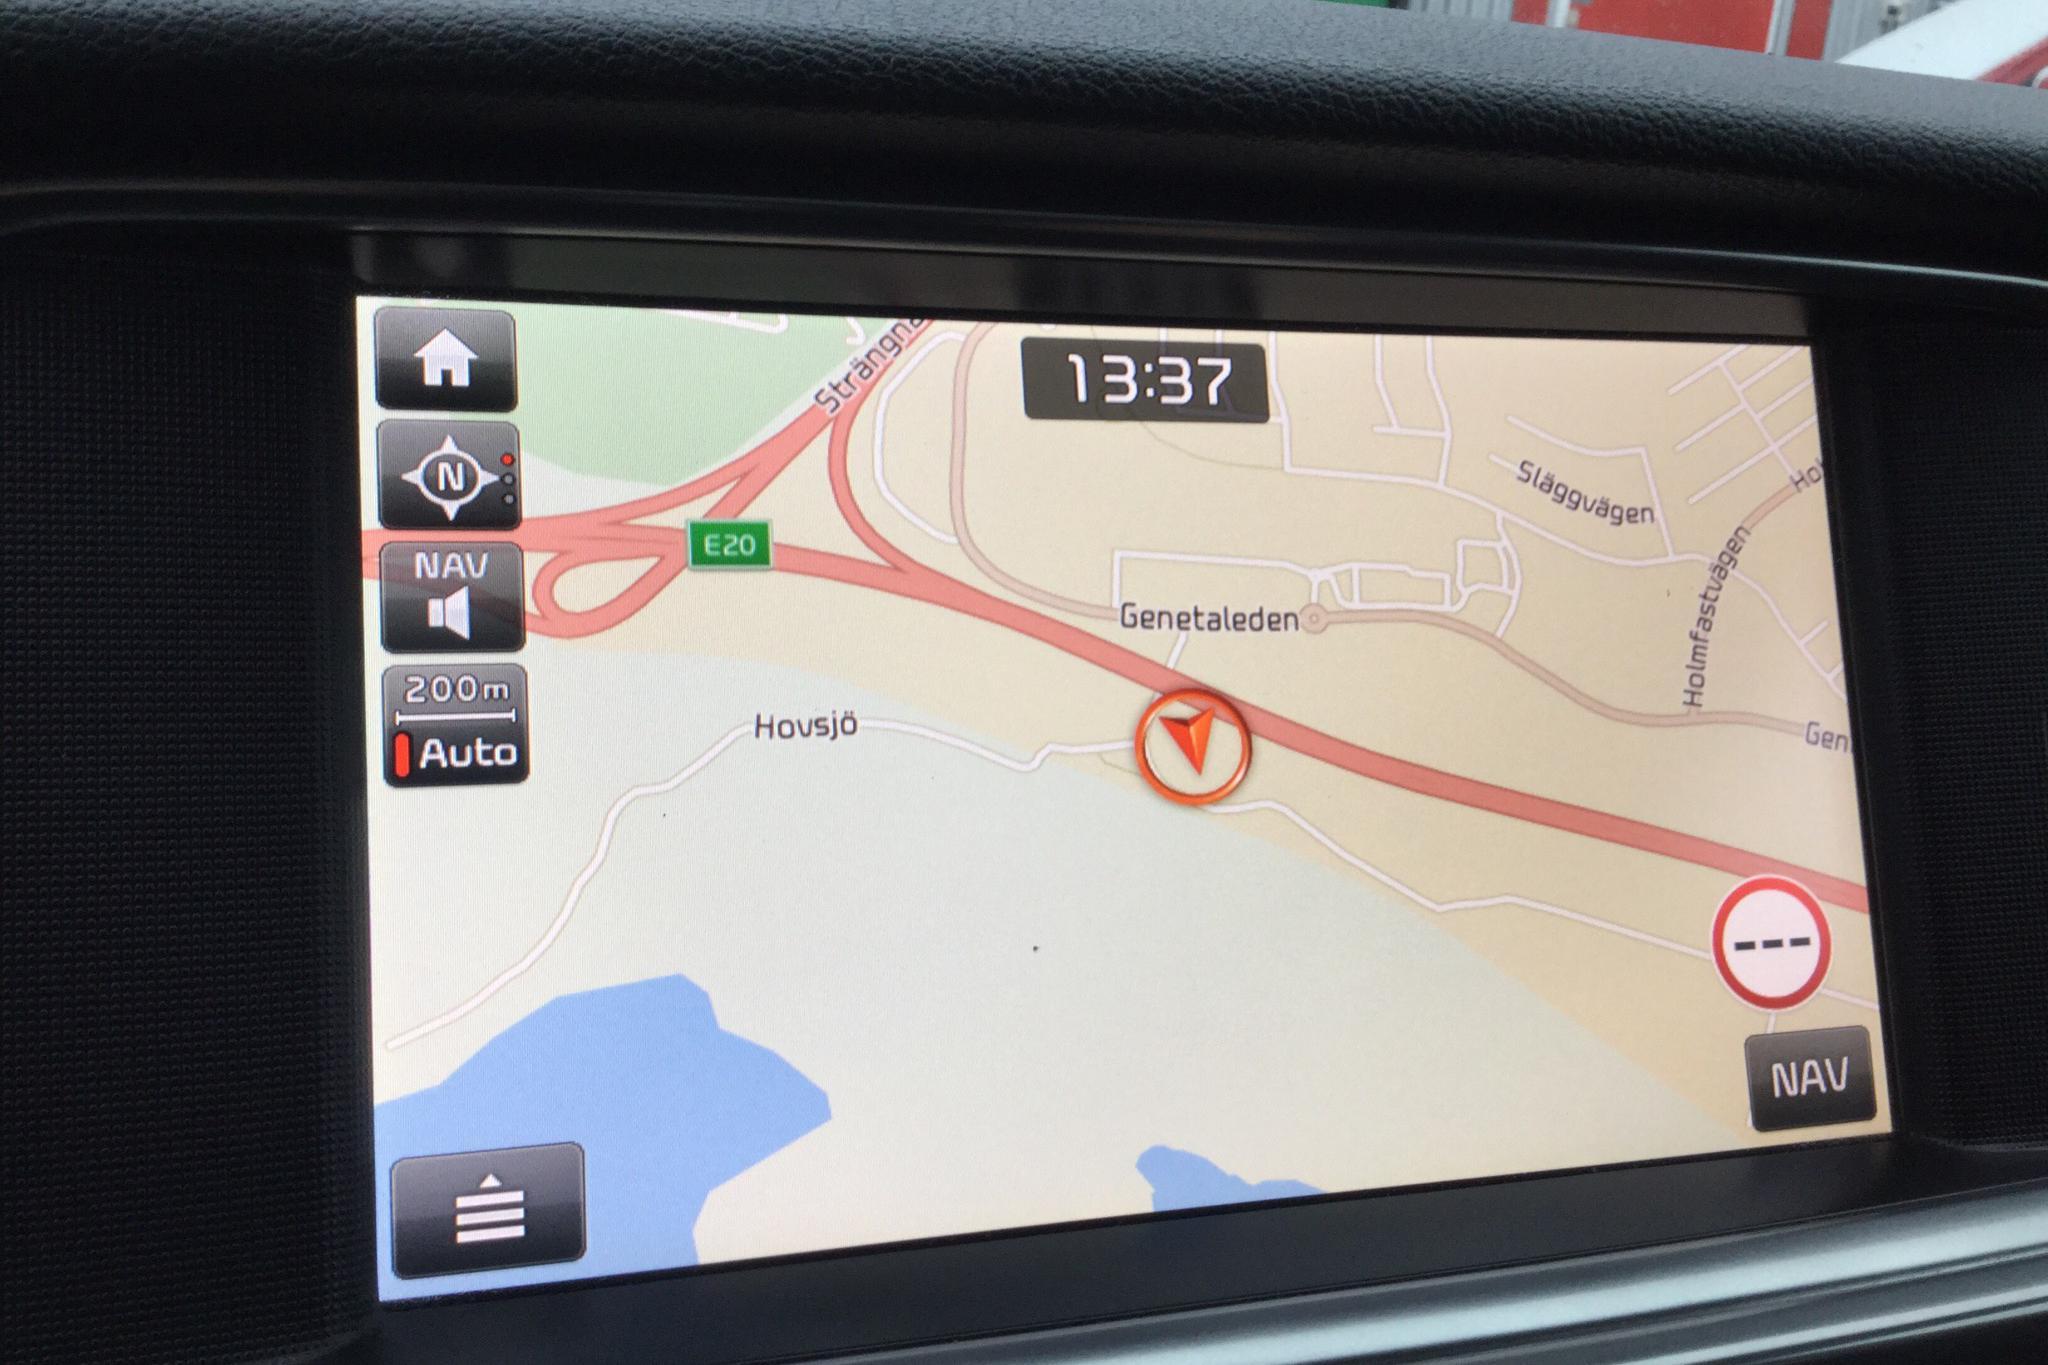 KIA Optima 1.7 CRDi SW (141hk) - 98 260 km - Automatic - red - 2017